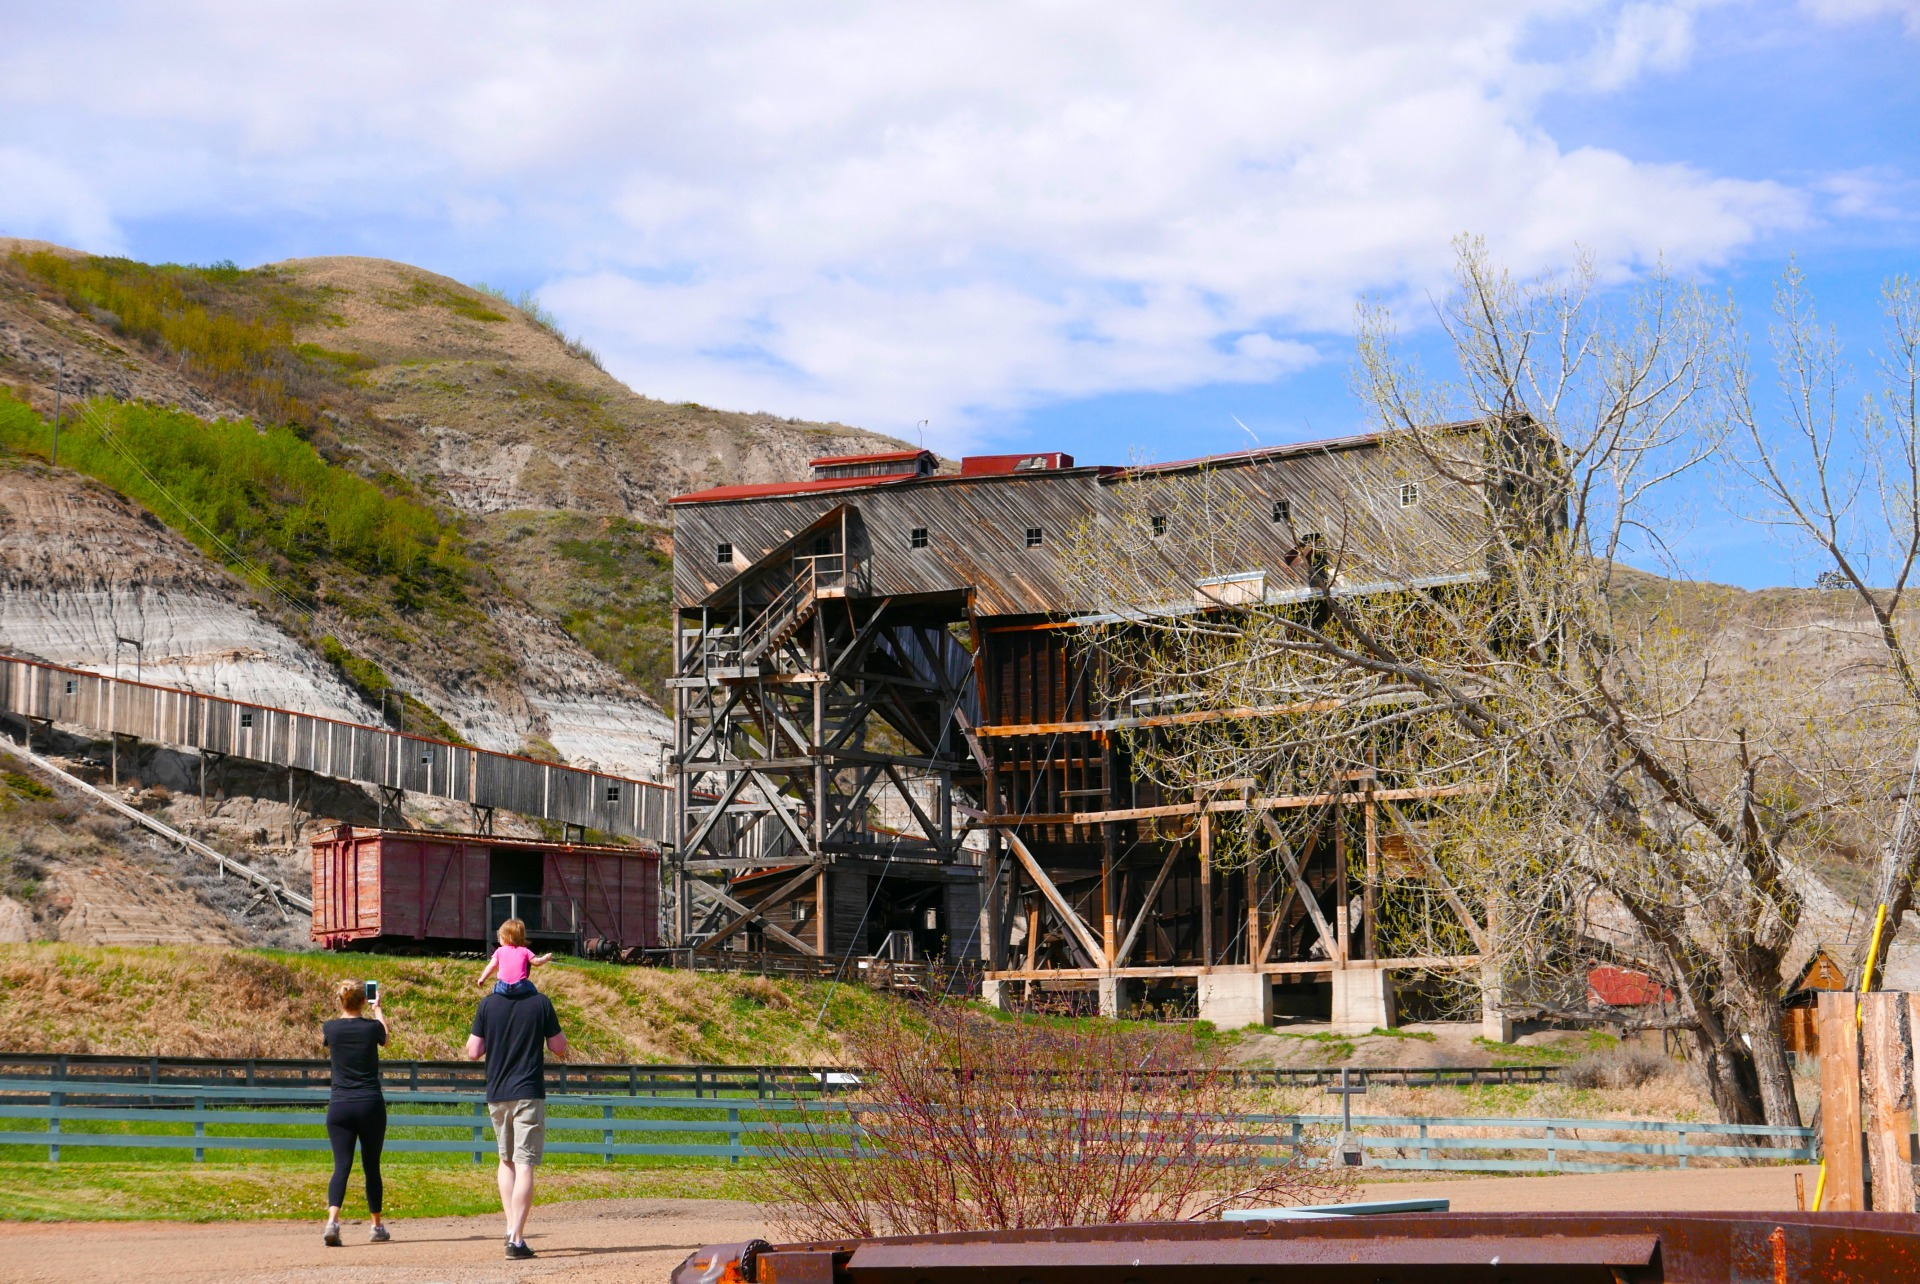 Entrada do Atlas Coal Mine (Claudia Tonaco)